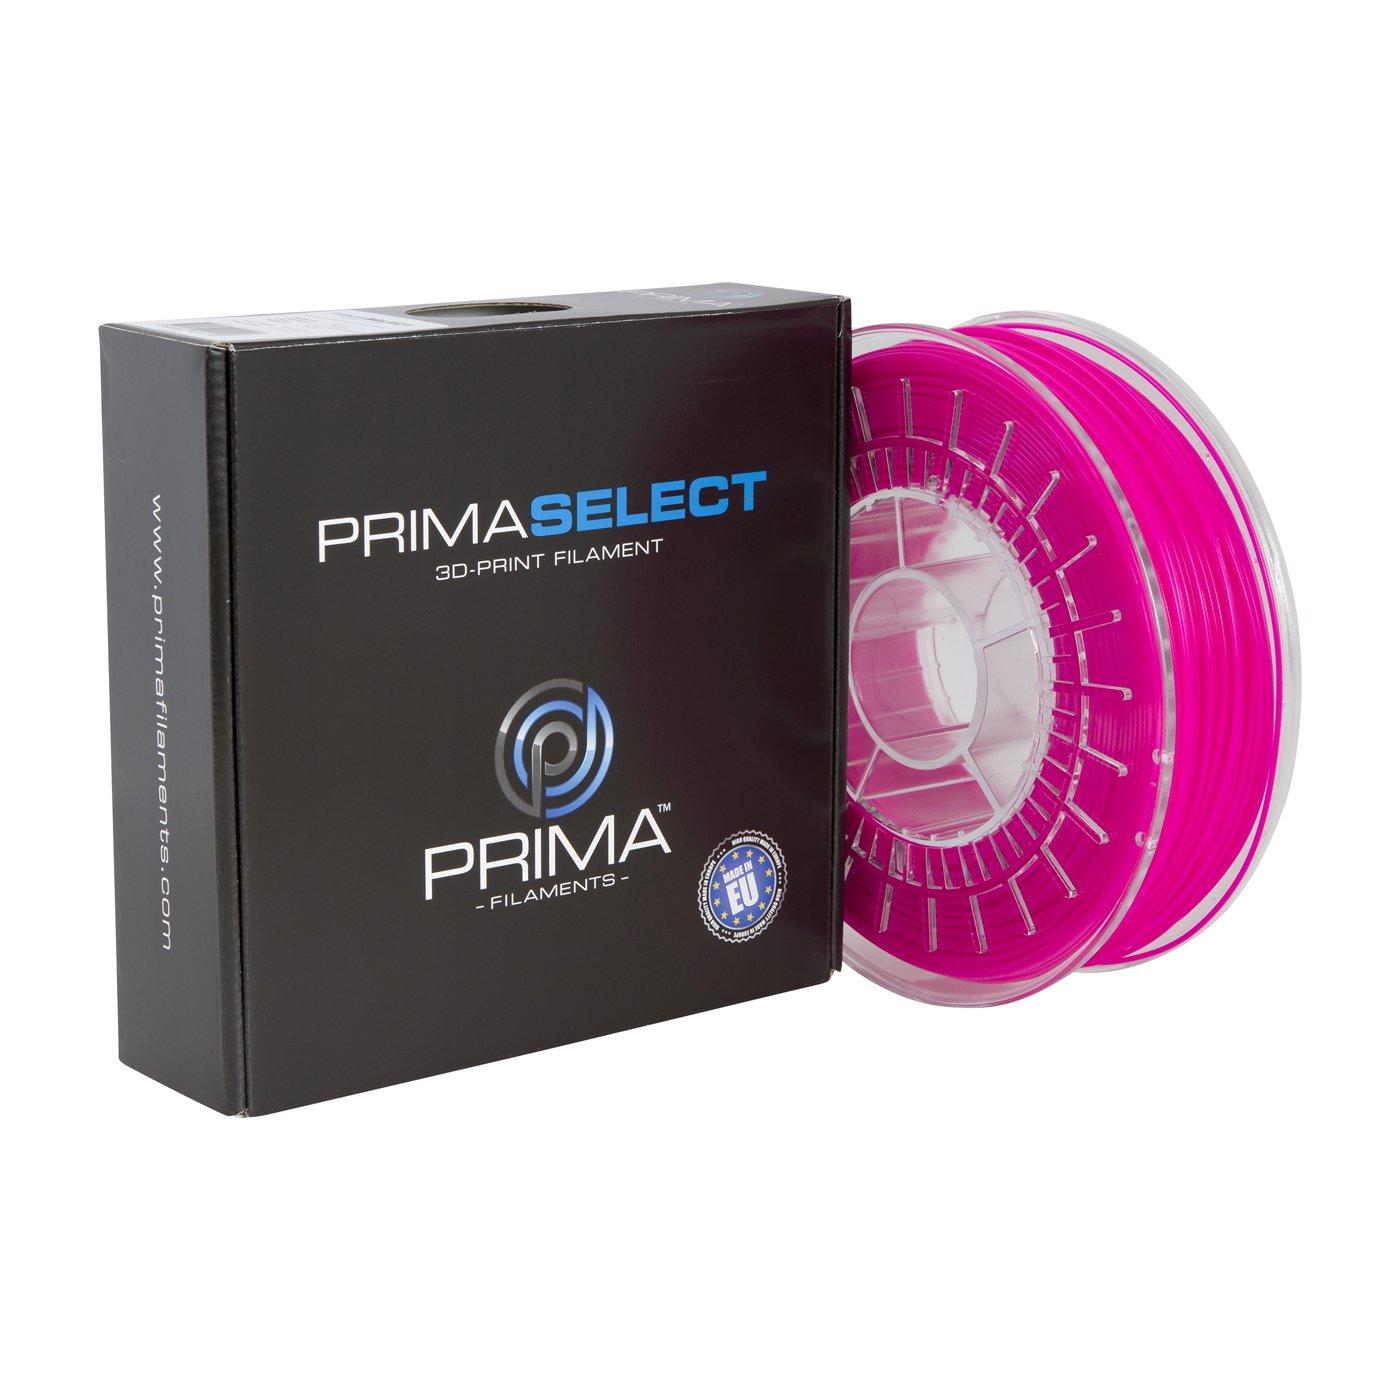 PrimaCreator PrimaSelect 3D Drucker Filament - PLA  - 1,75 mm - 750 g  - Silber B01KRPHN5C Filament-3D-Druckmaterialien